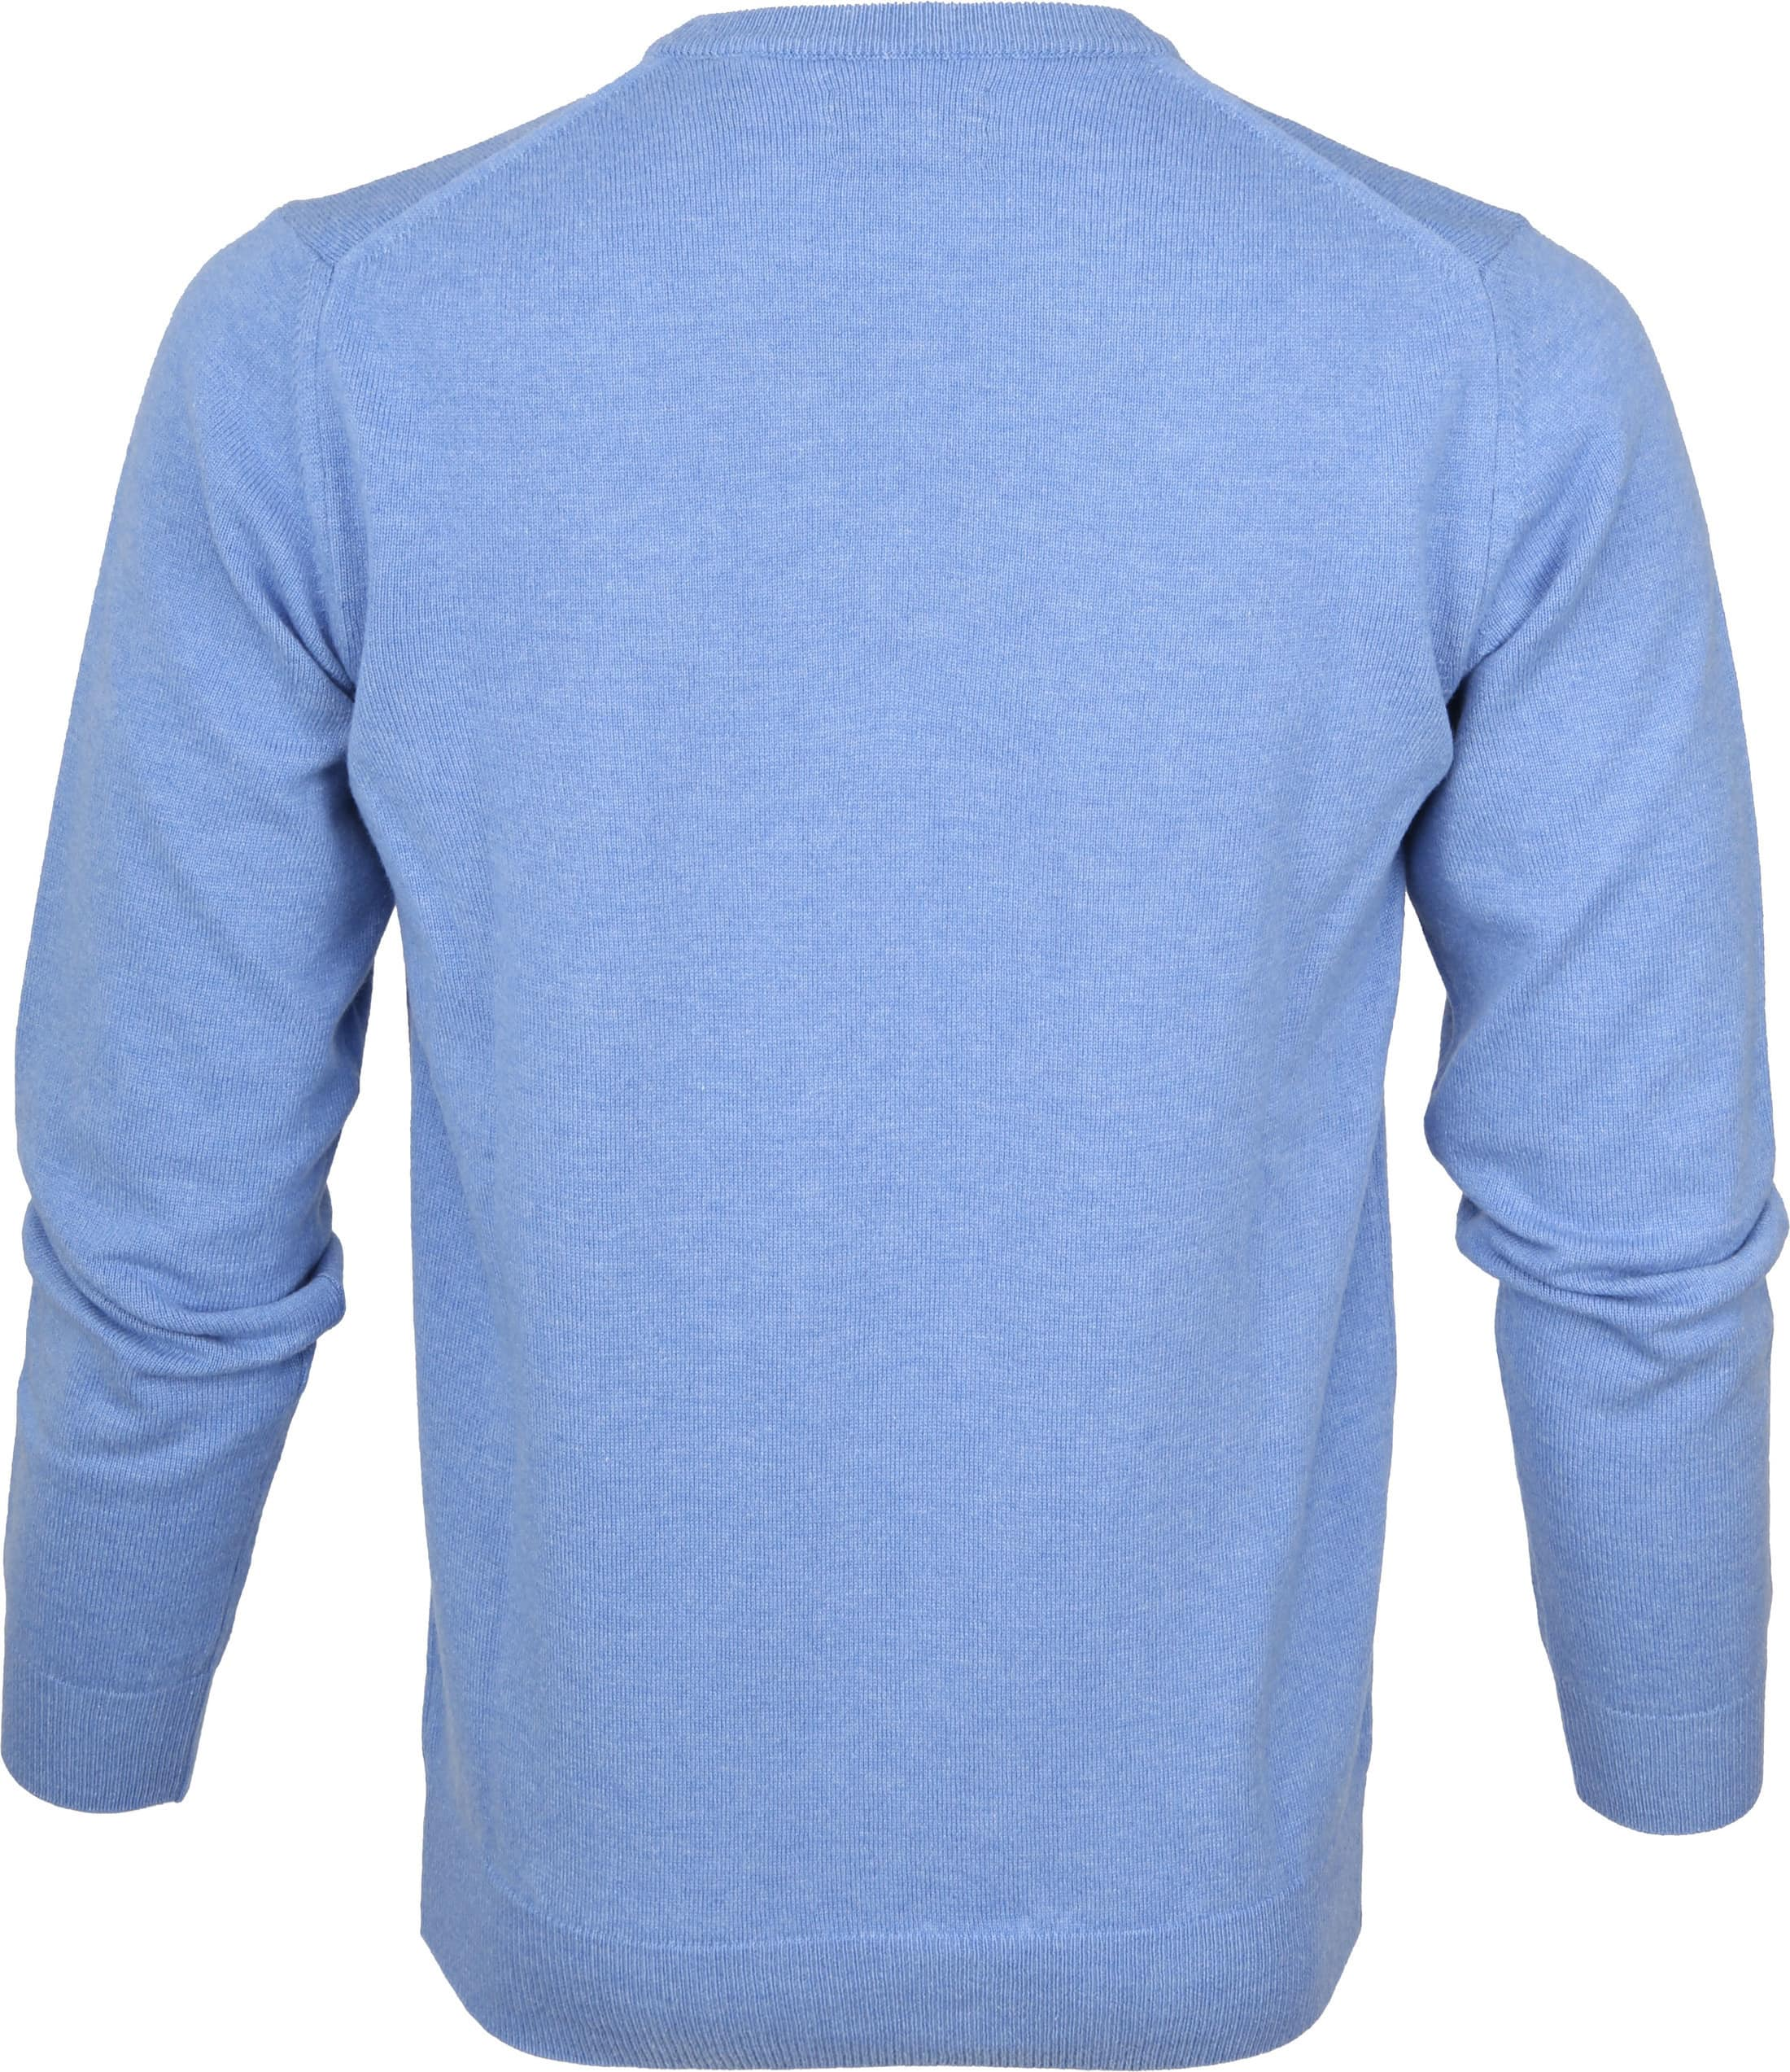 Gant Pullover Lammwolle Light Blue foto 2